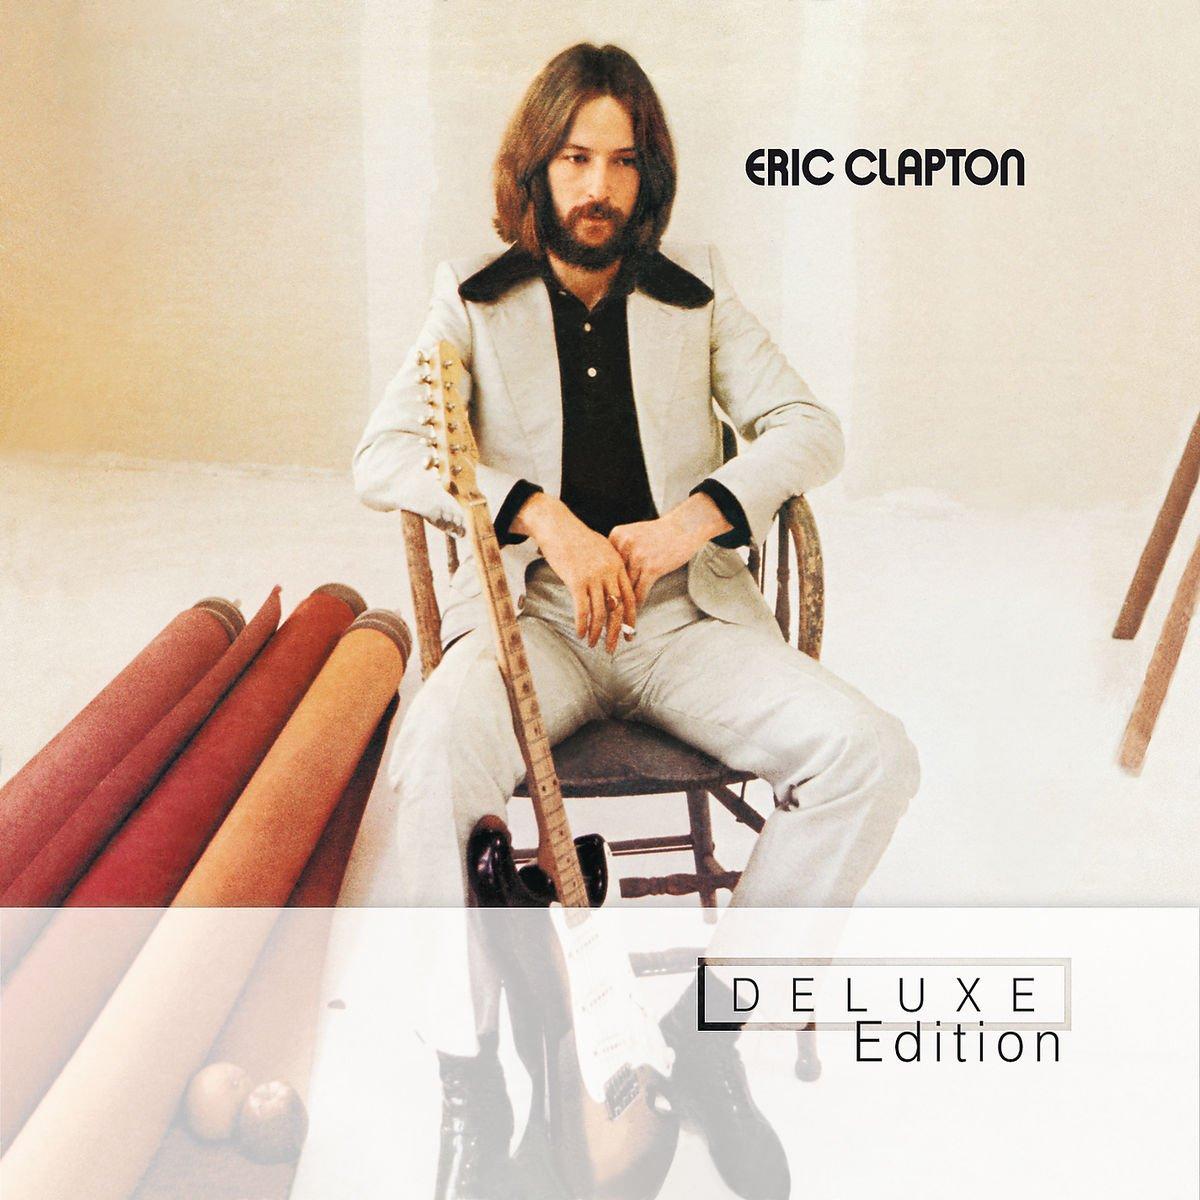 Eric Clapton - Eric Clapton [Deluxe Edition] - Amazon.com Music